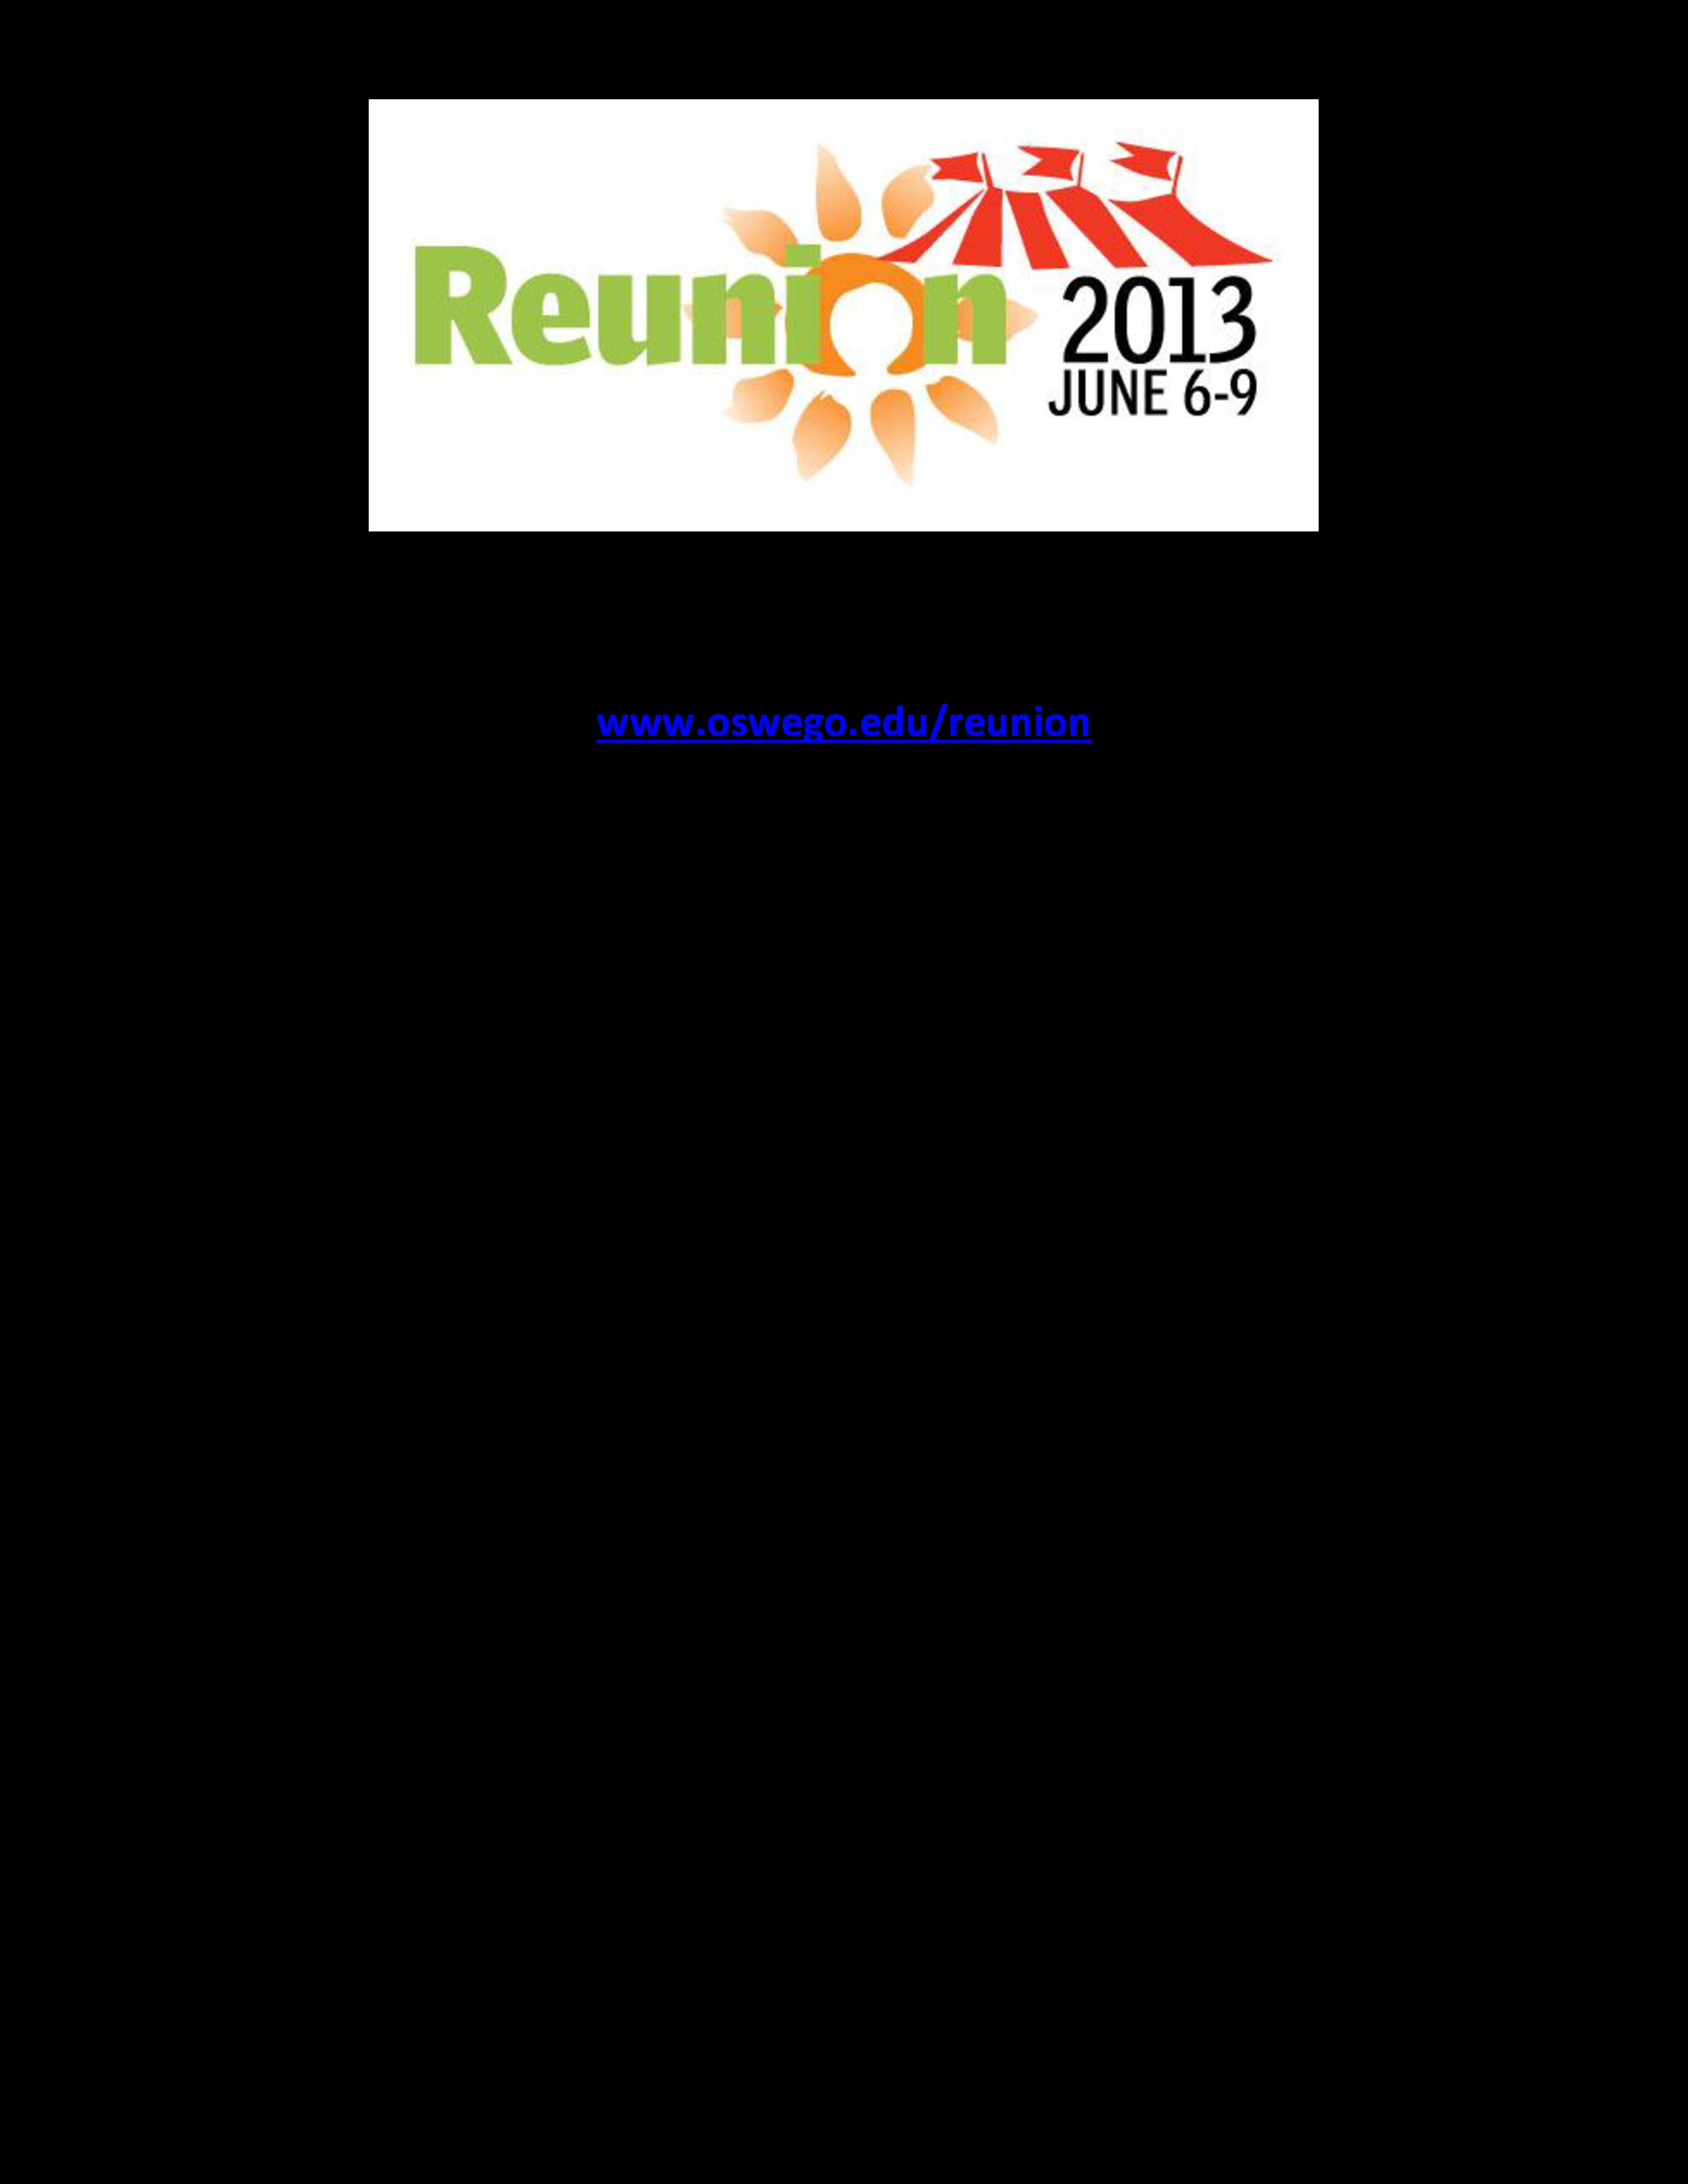 Reunion Program Agenda   Templates at allbusinesstemplates.com